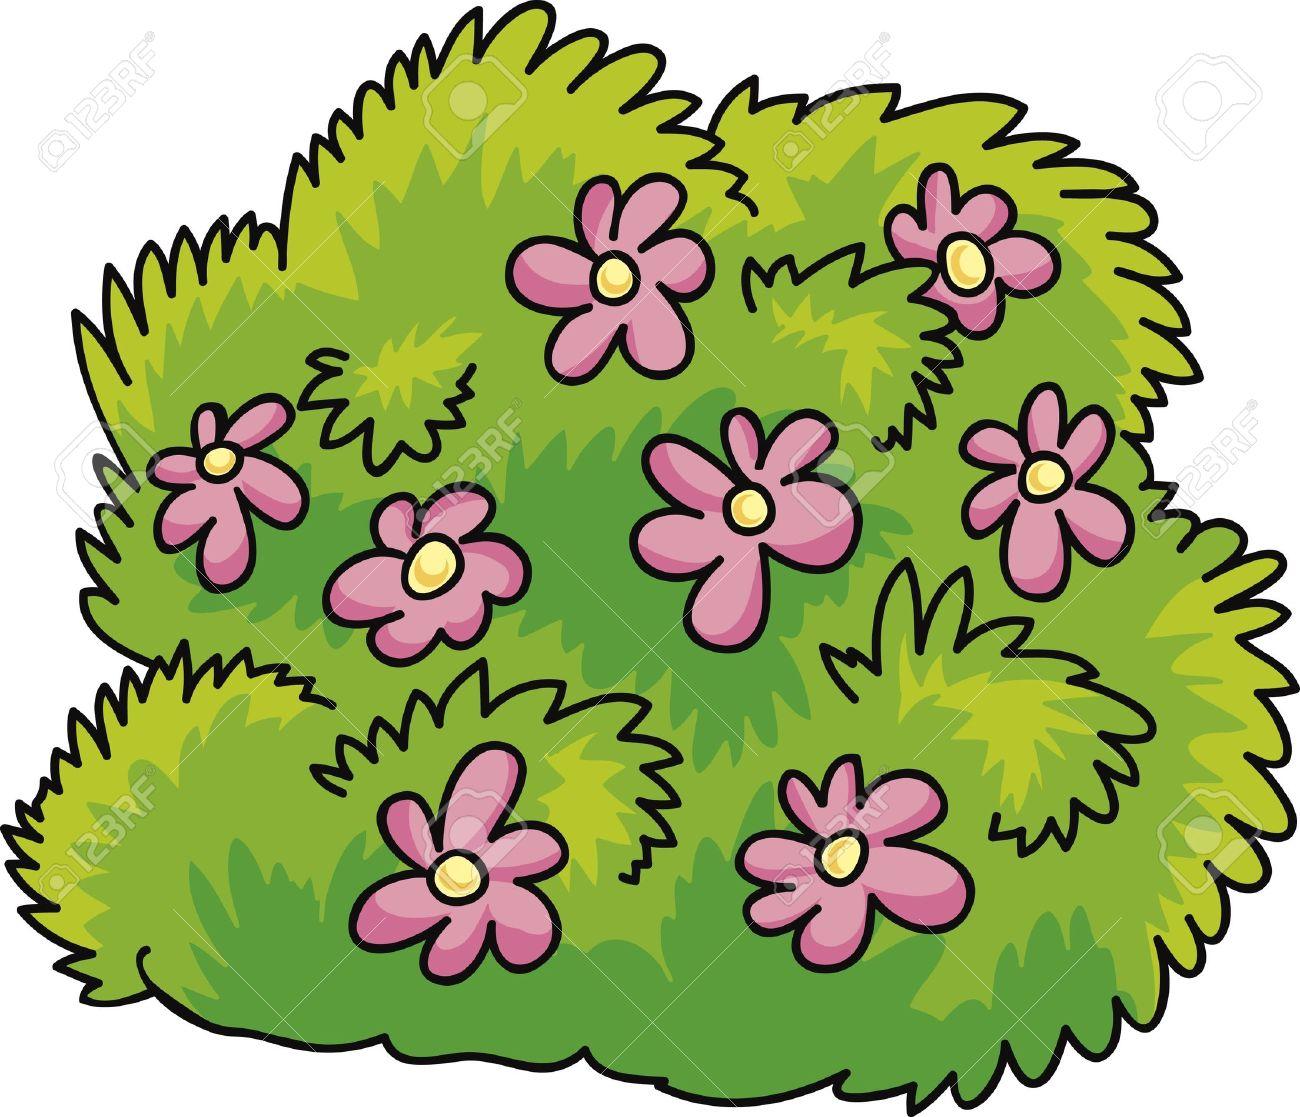 Cartoon illustration of green bush with pink flowers royalty free cartoon illustration of green bush with pink flowers stock vector 10746490 mightylinksfo